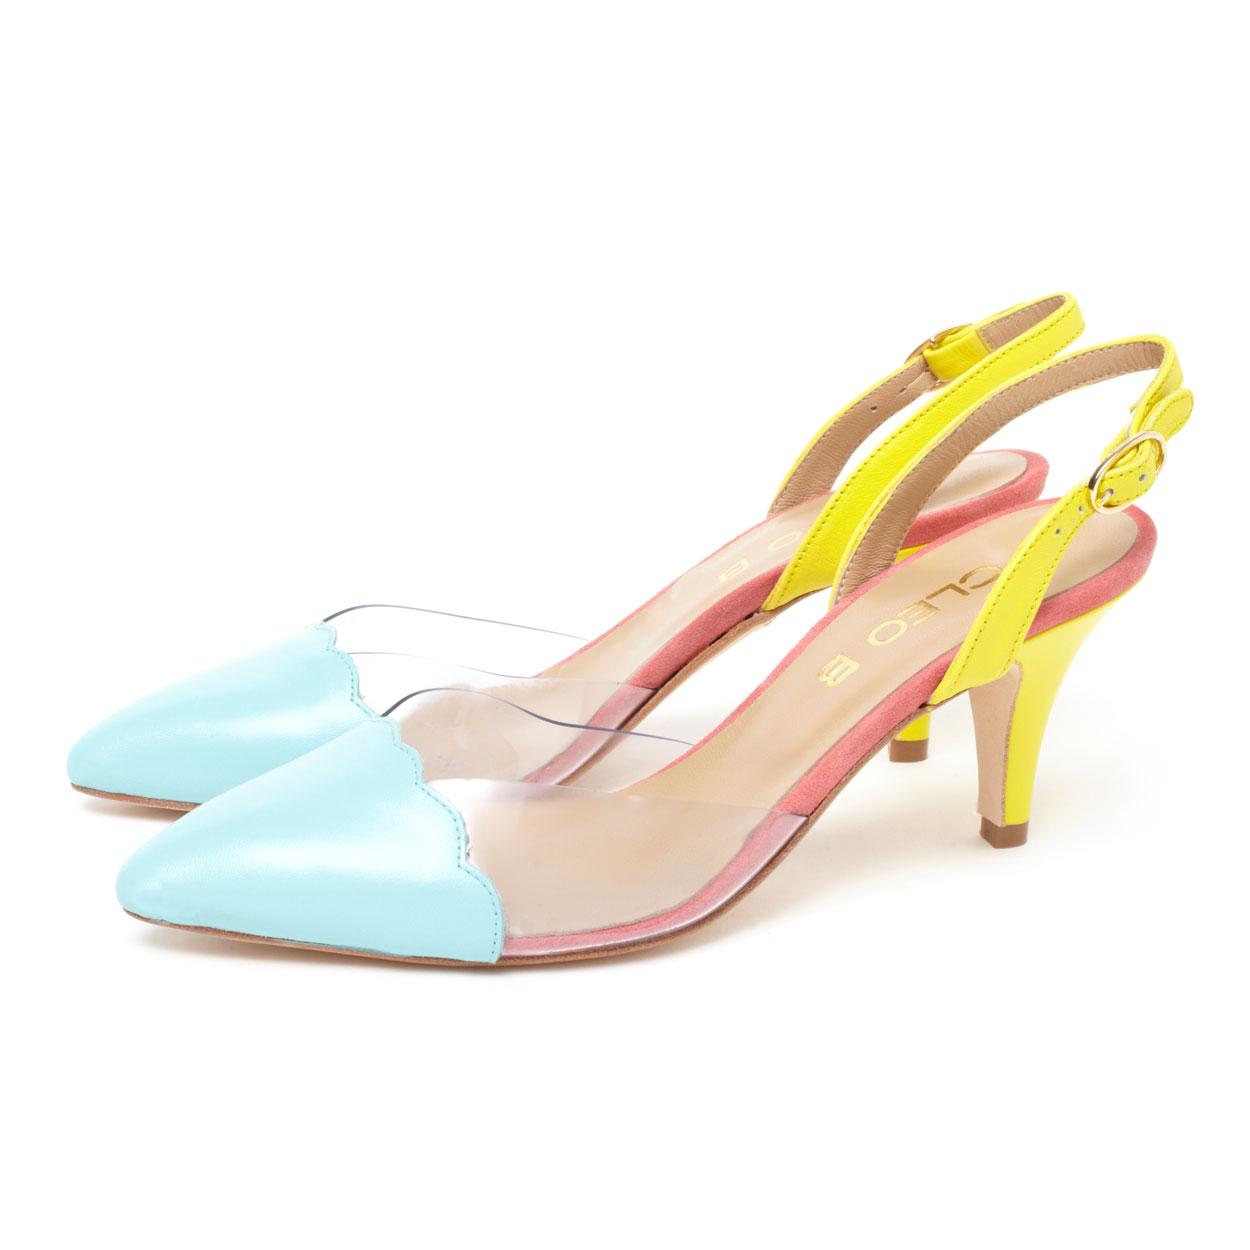 Ringo_multi_pair_kitten_heel_cleo_b_shoes_london_web.jpg